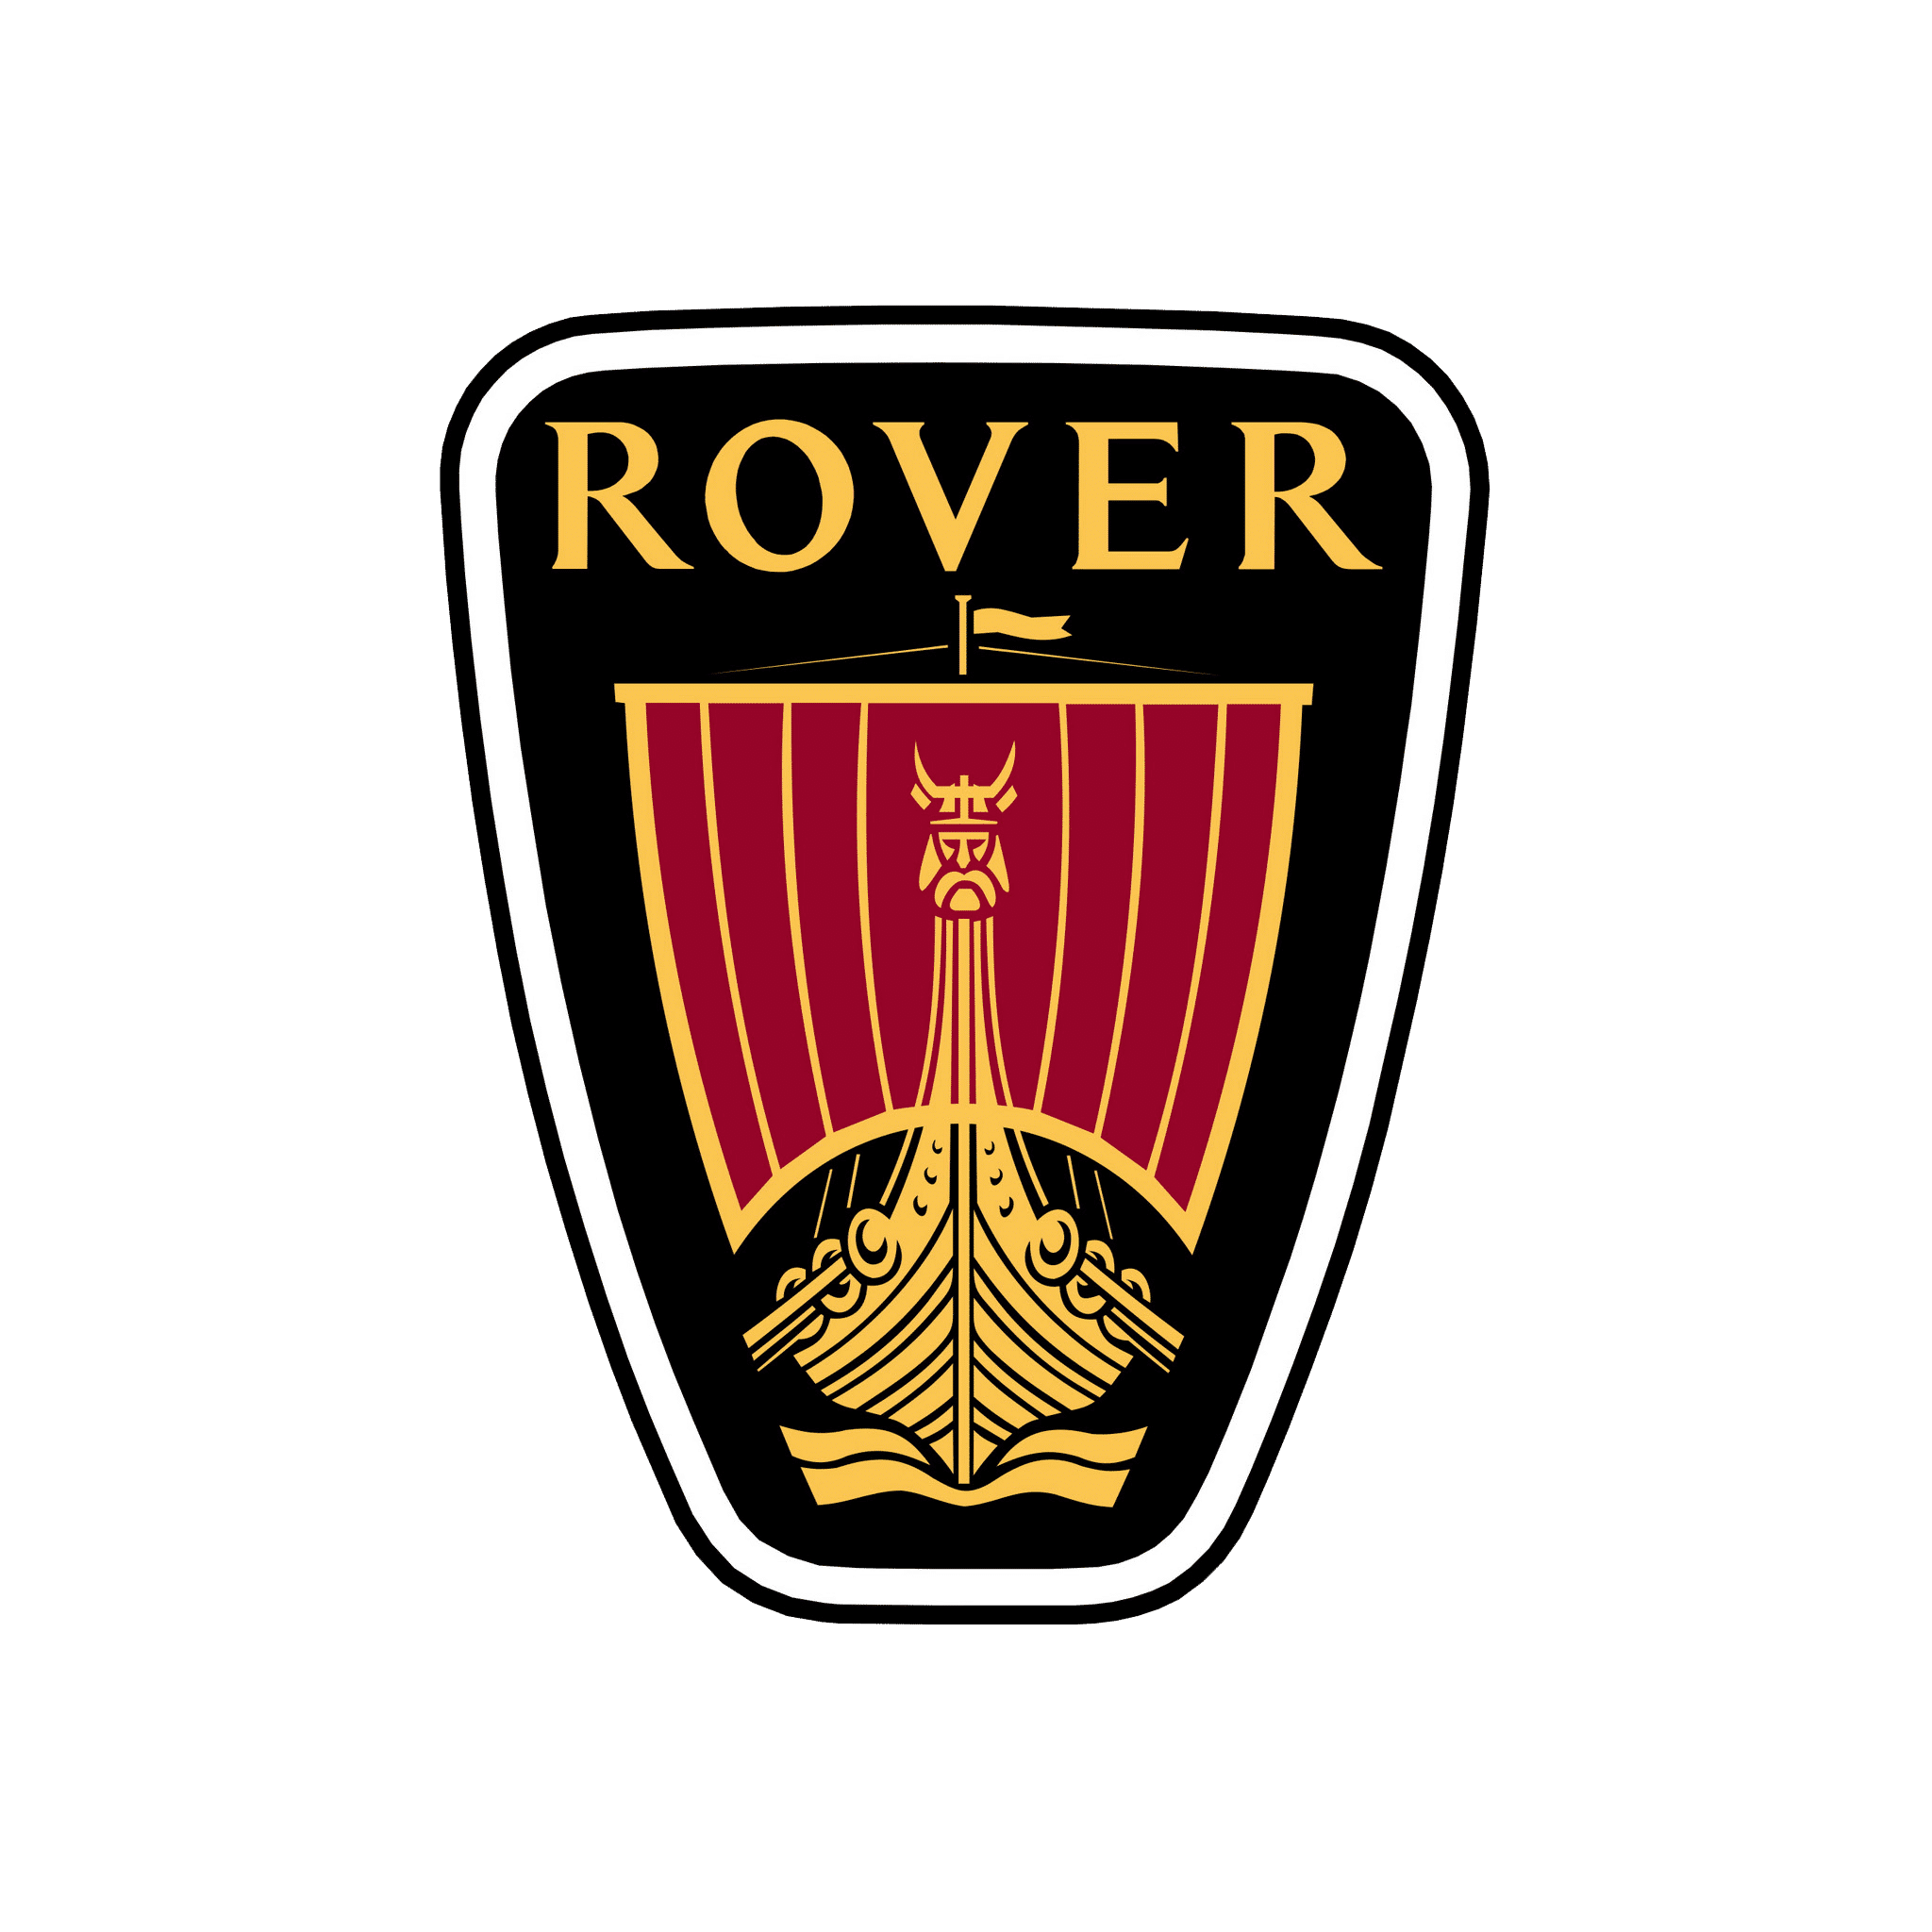 75 1998 – 2005